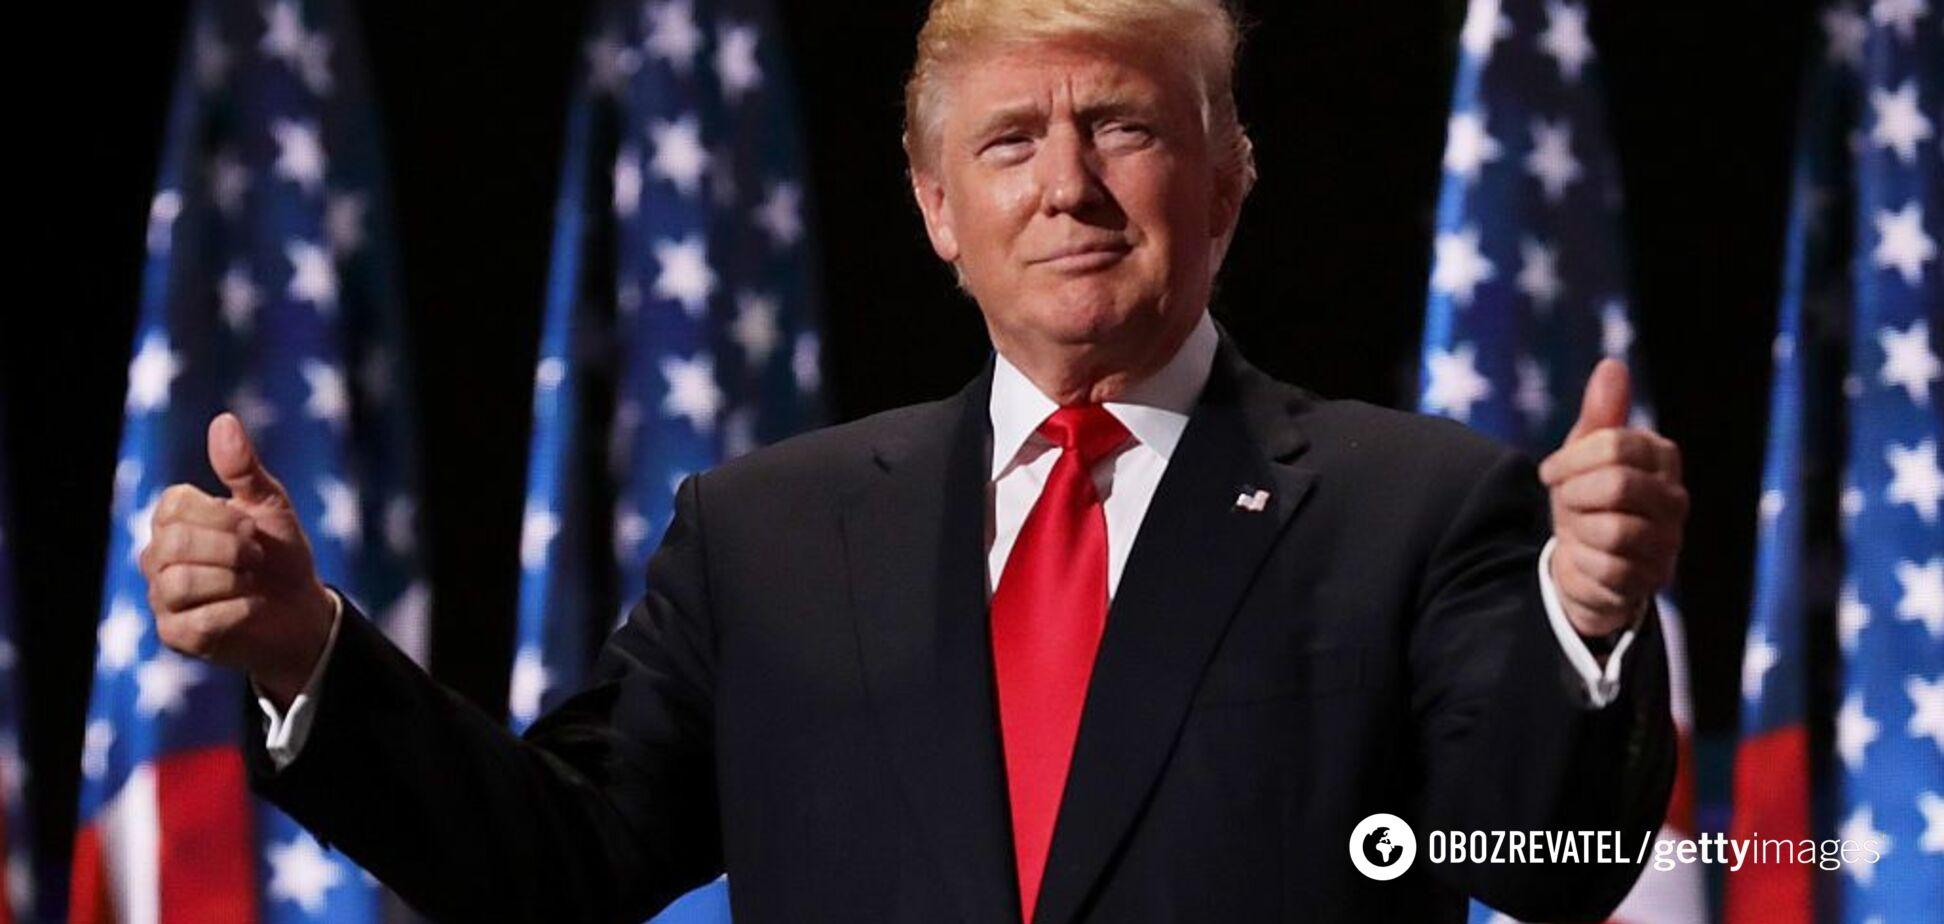 Трамп объявил о полном освобождении Сирии и Ирака от террористов